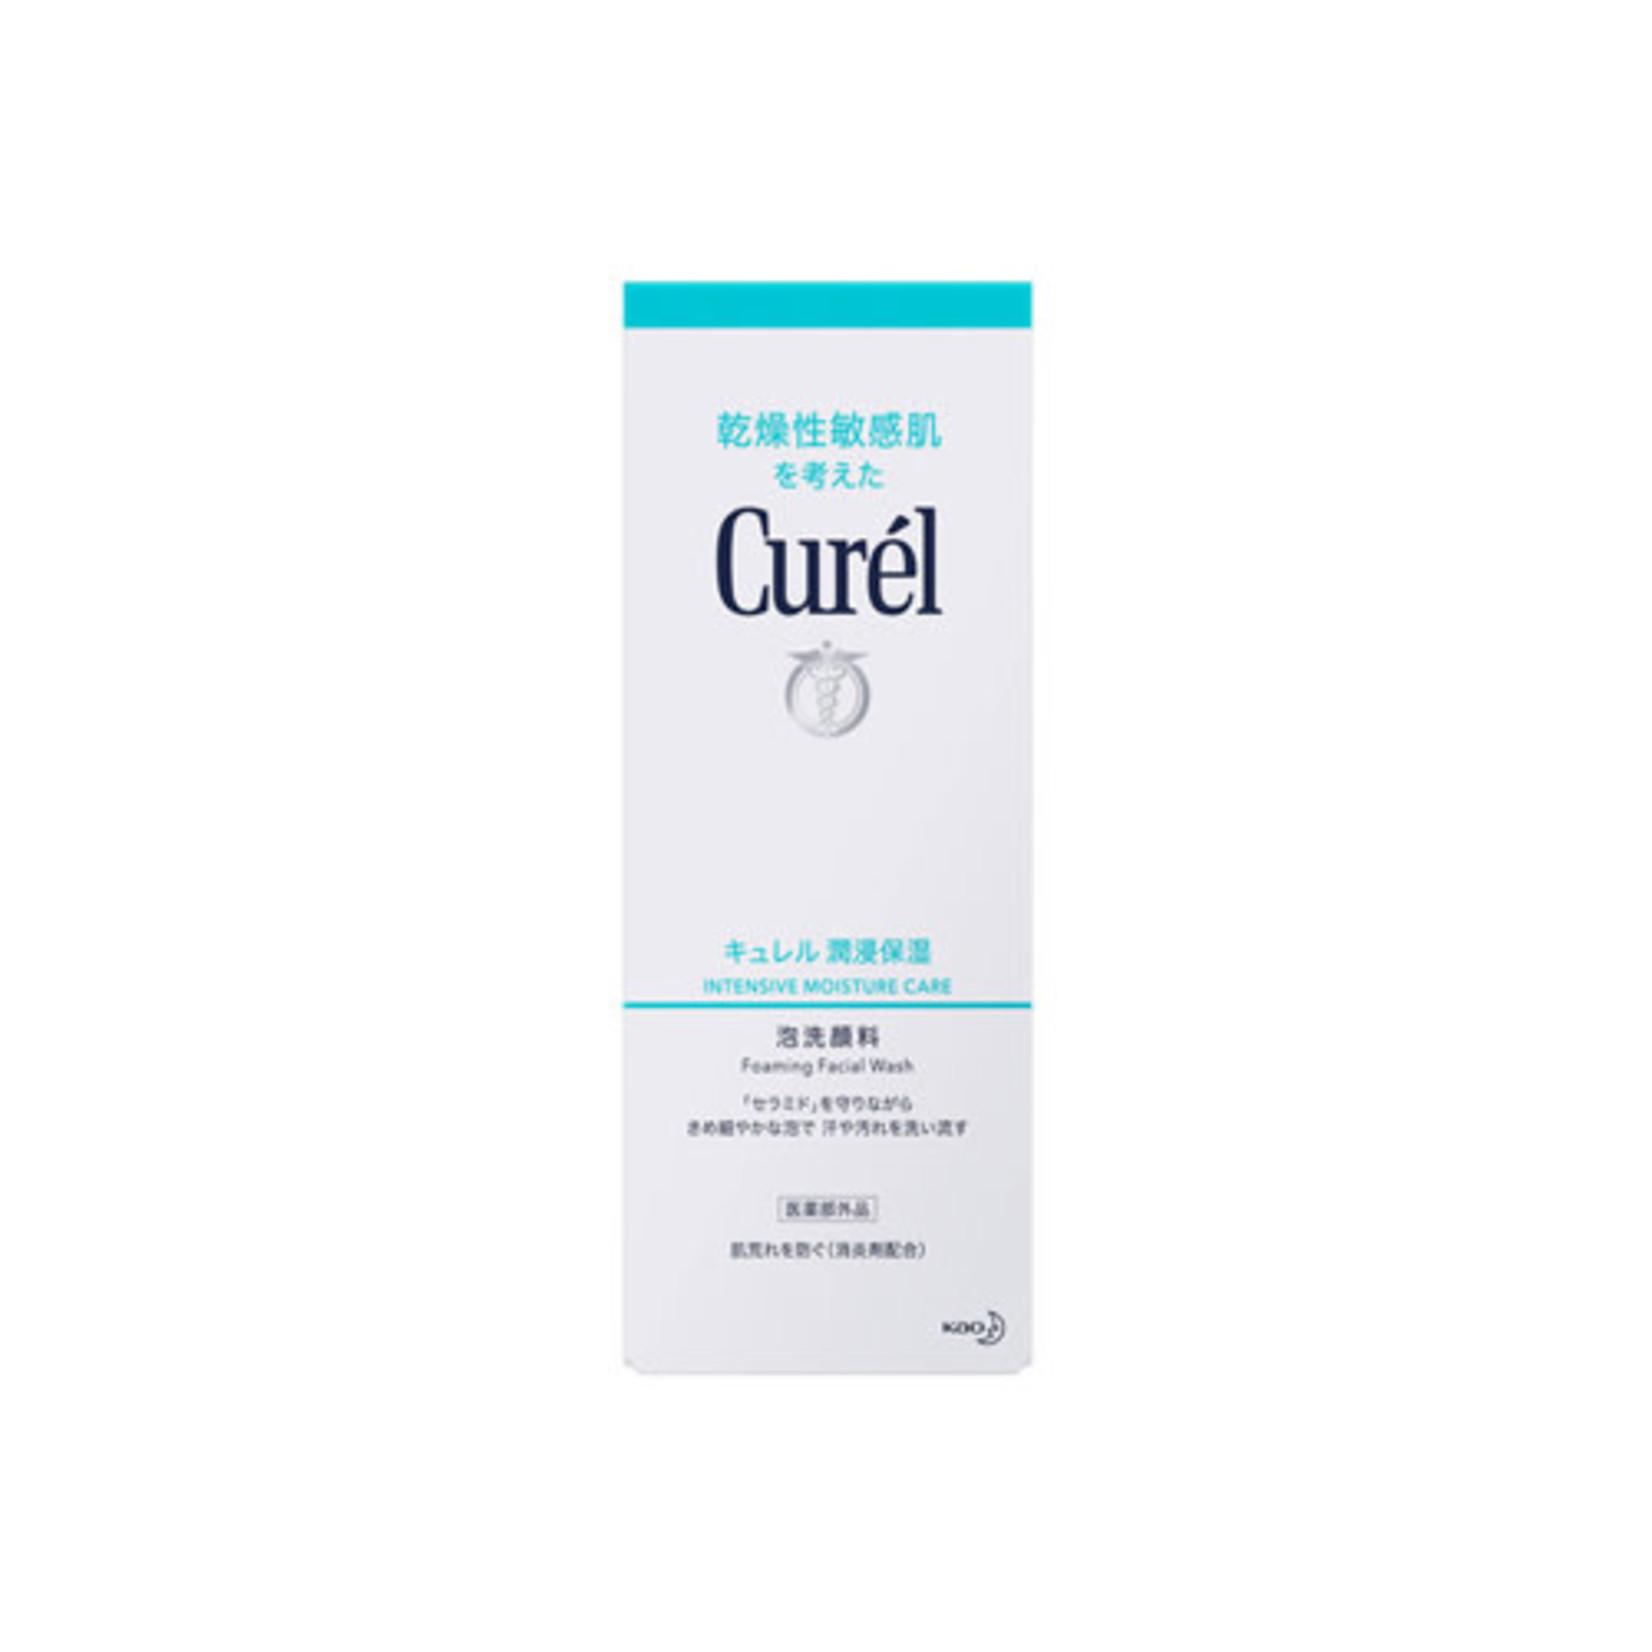 Curel Kao Curél Intensive Moisture Care Foaming Wash 150ml